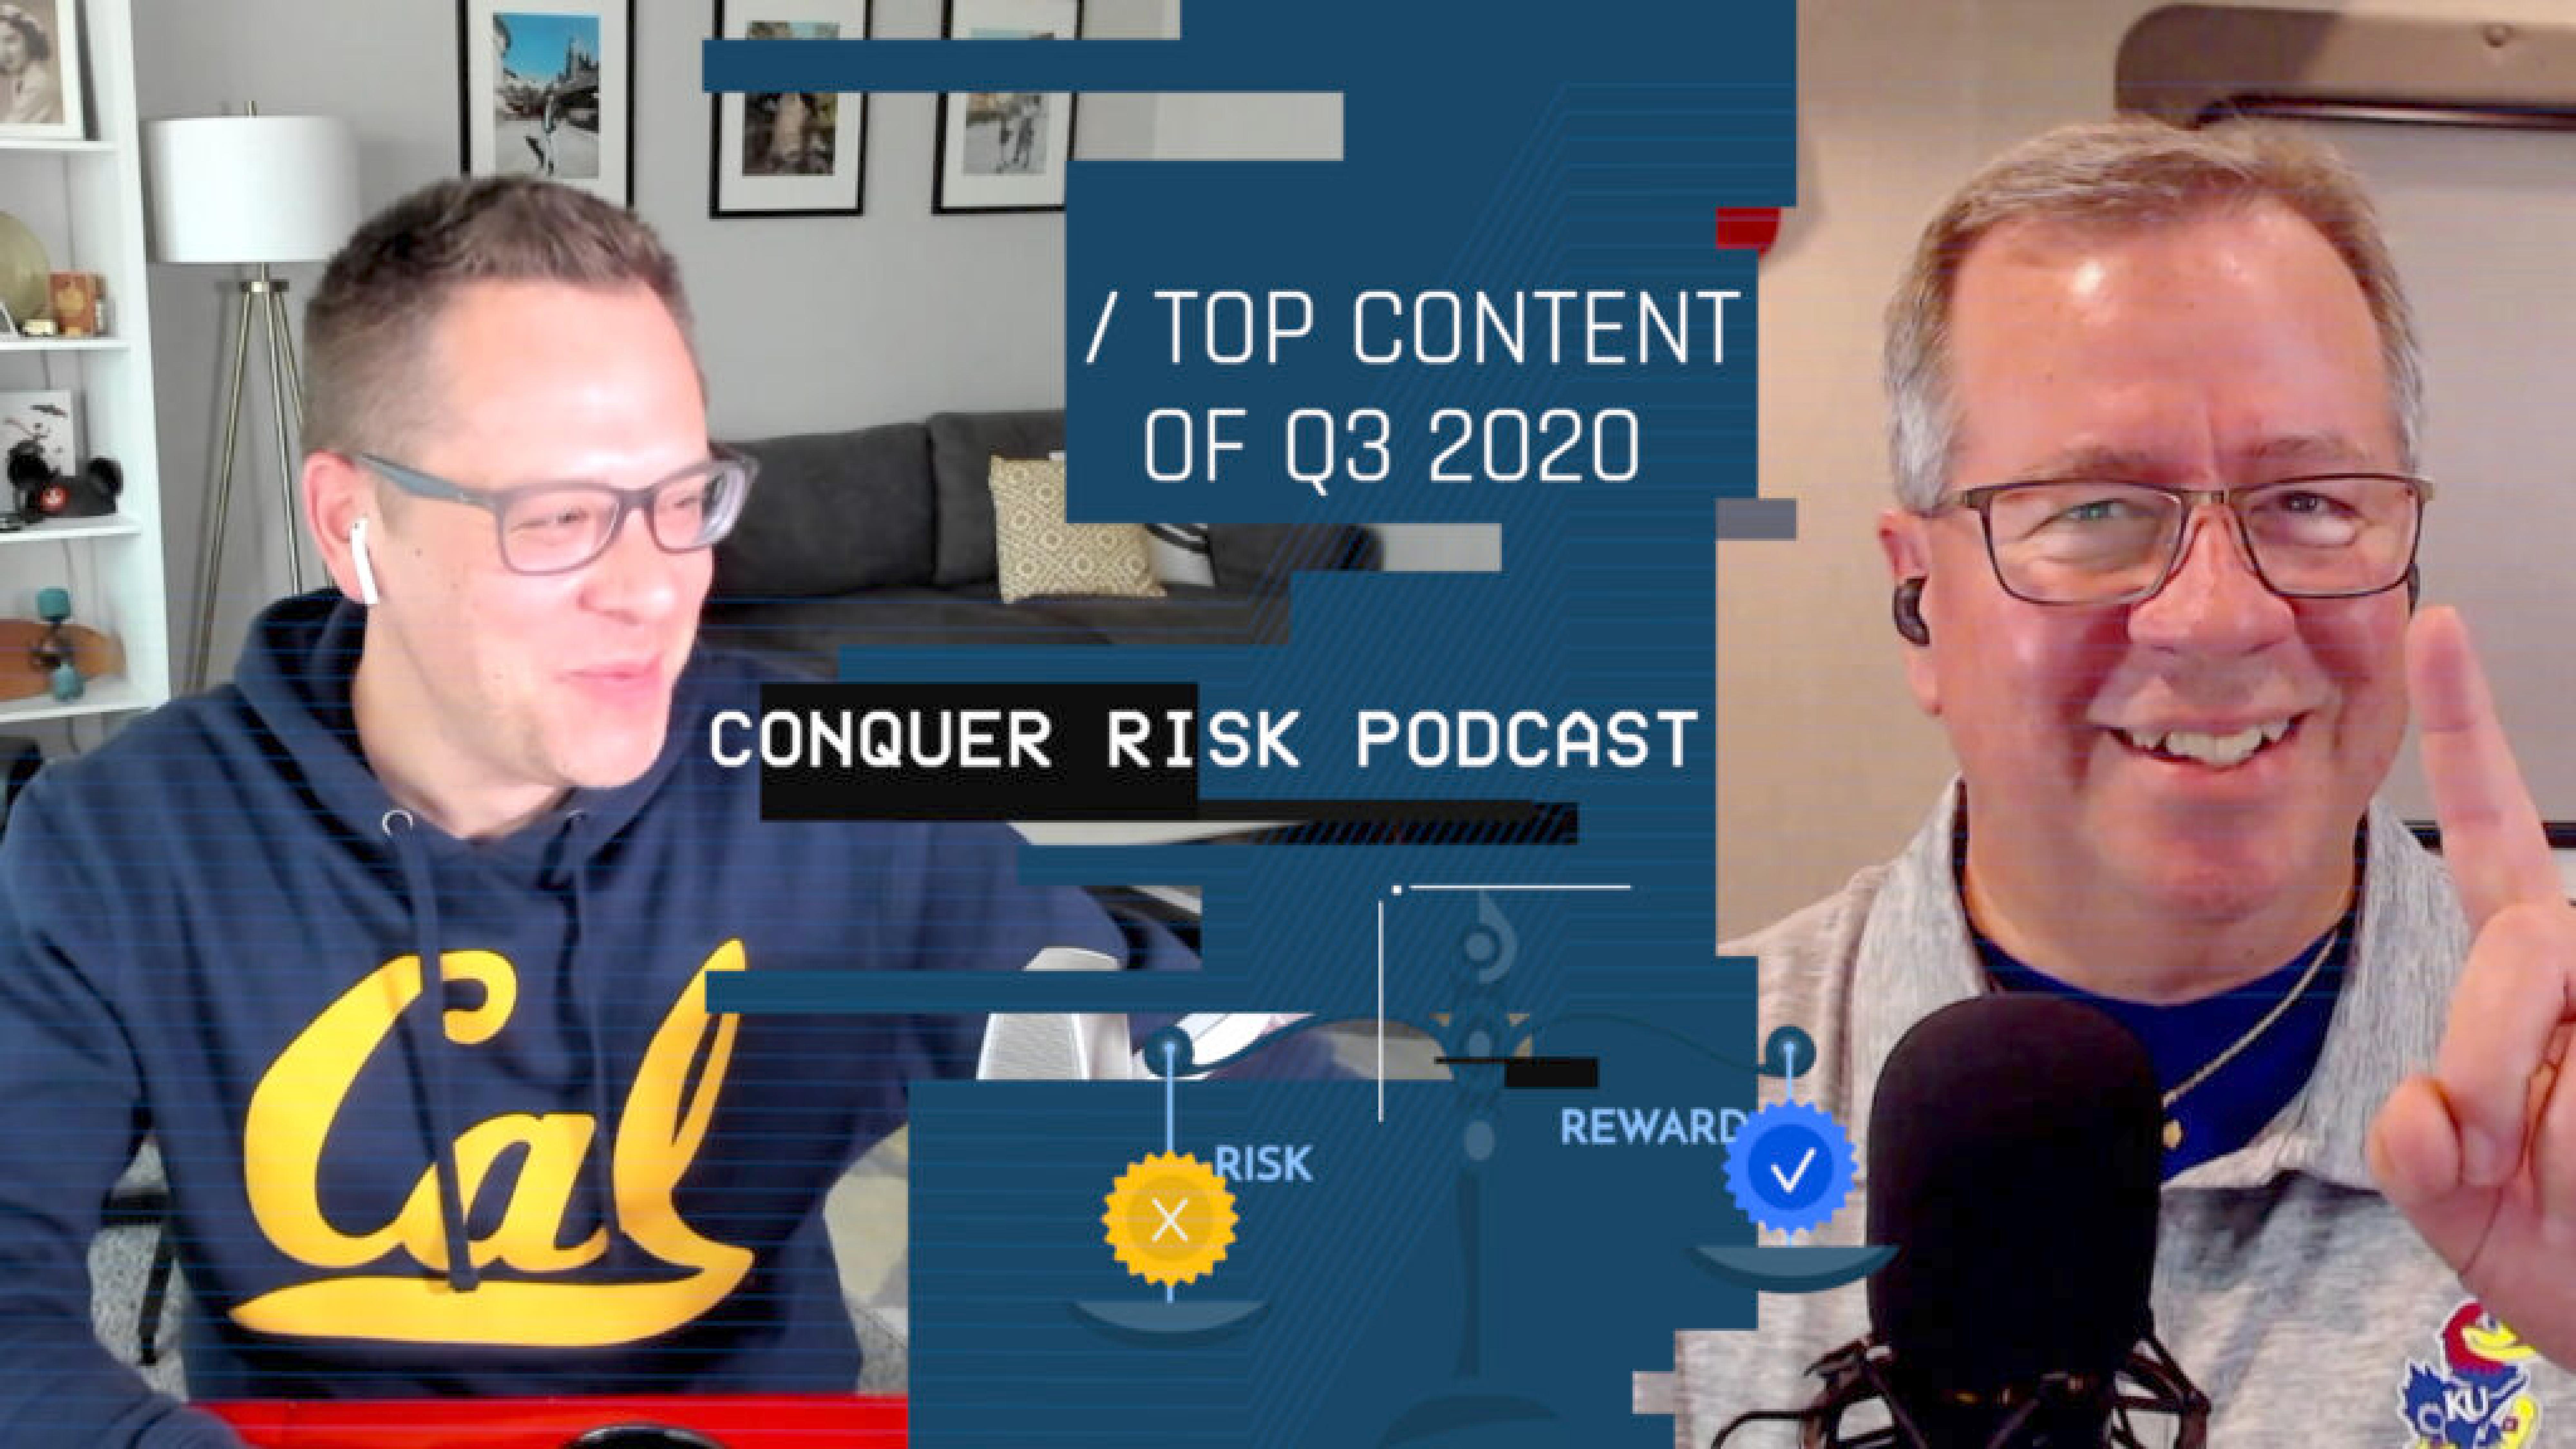 Top Content of Q3 2020 (S3 E13)